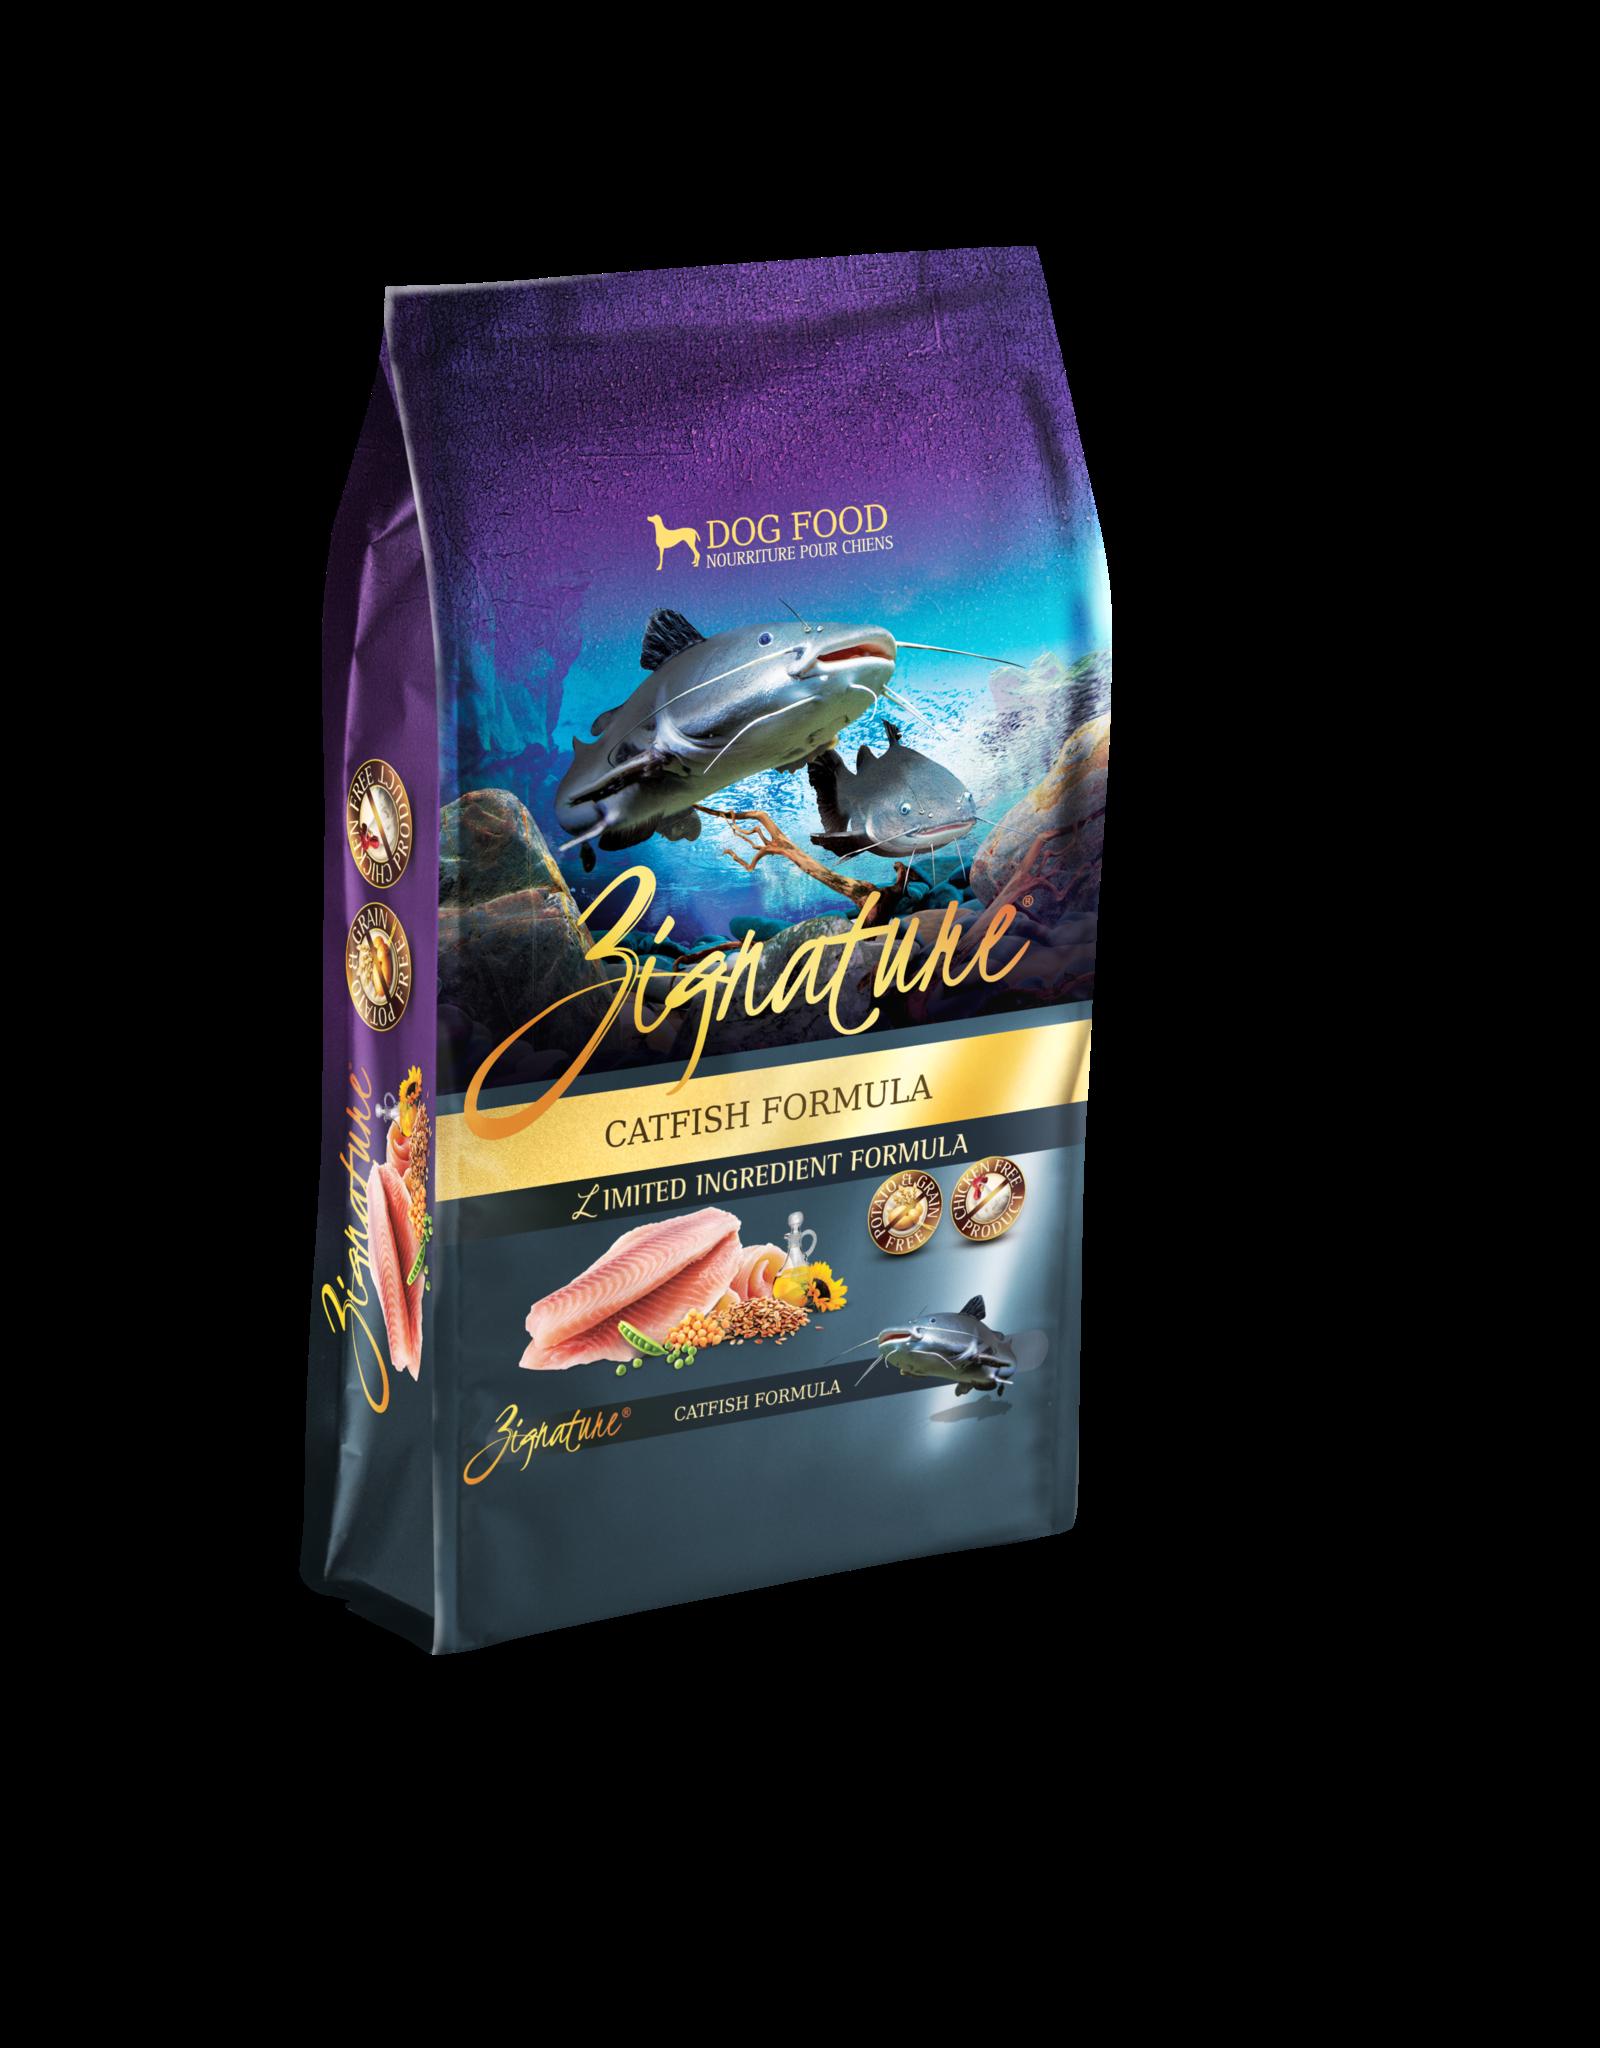 Zignature Zignature Dog Food Catfish Formula